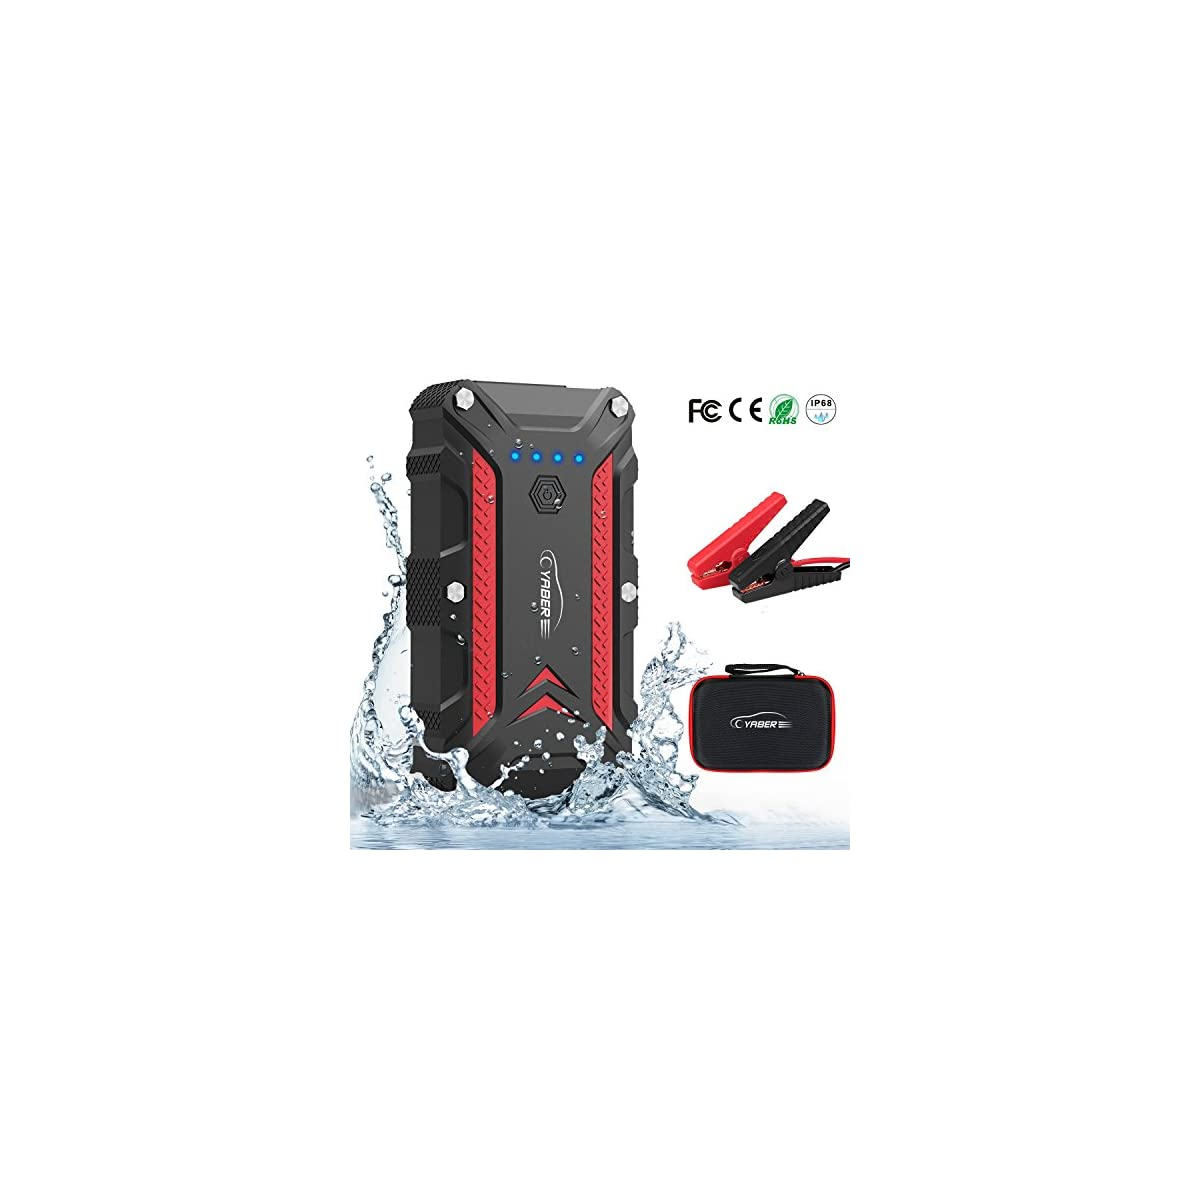 51KG9qIz5PL. SS1200  - Arrancador de Coches, YABER 1200A Arrancador Batería Coche (para 7.5L de Gasolina o 6.0L de Diesel) con IP68 Impermeable, Jump Starter con Carga Rápida QC3.0 Type C y 4 Modos Linterna LED